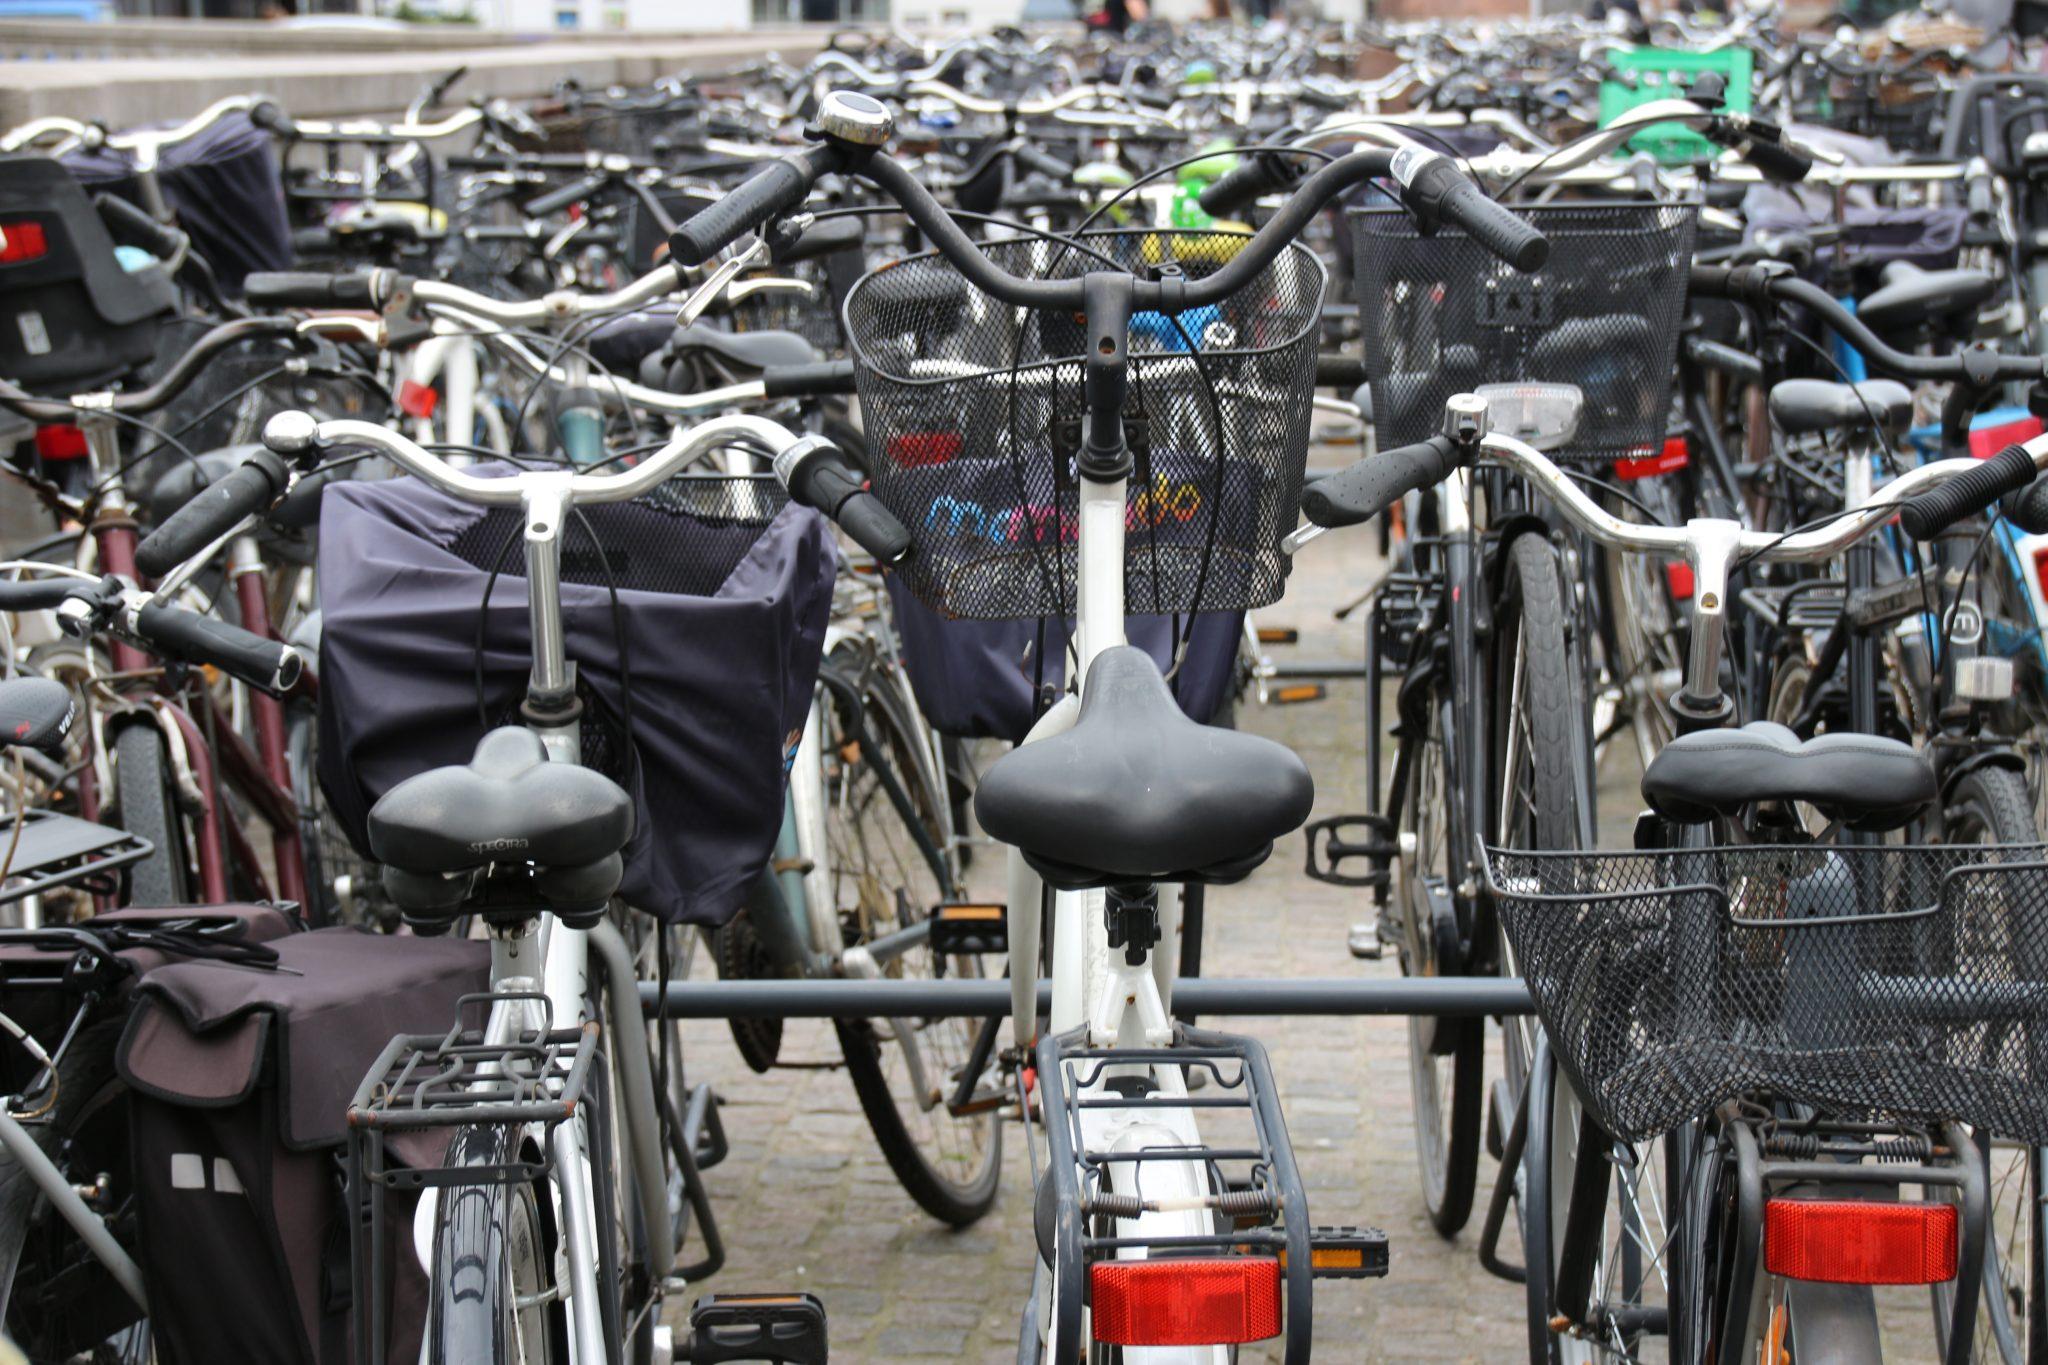 Bikes in Copenhagen, Denmark